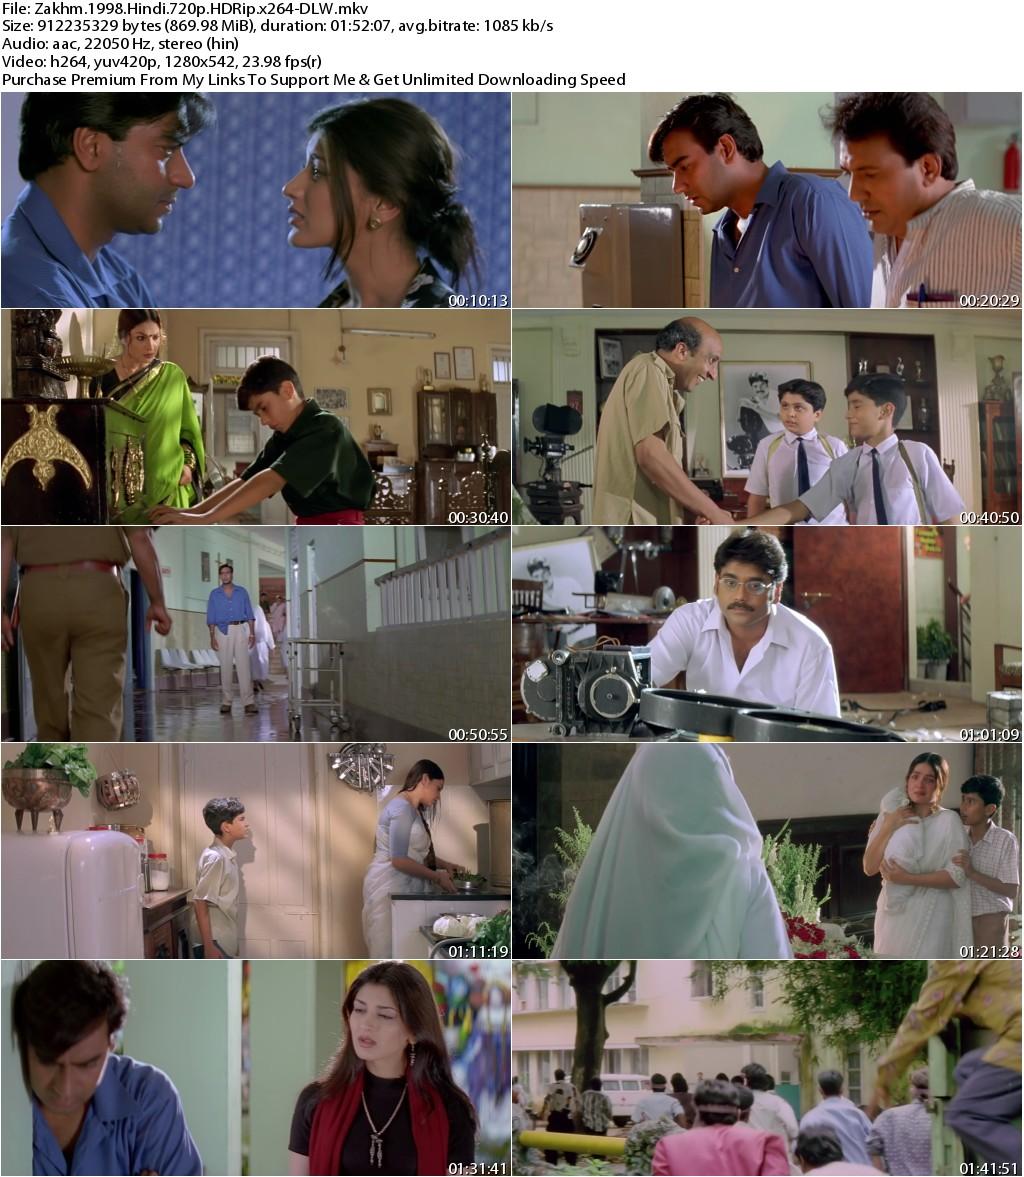 Zakhm (1998) Hindi 720p HDRip x264-DLW